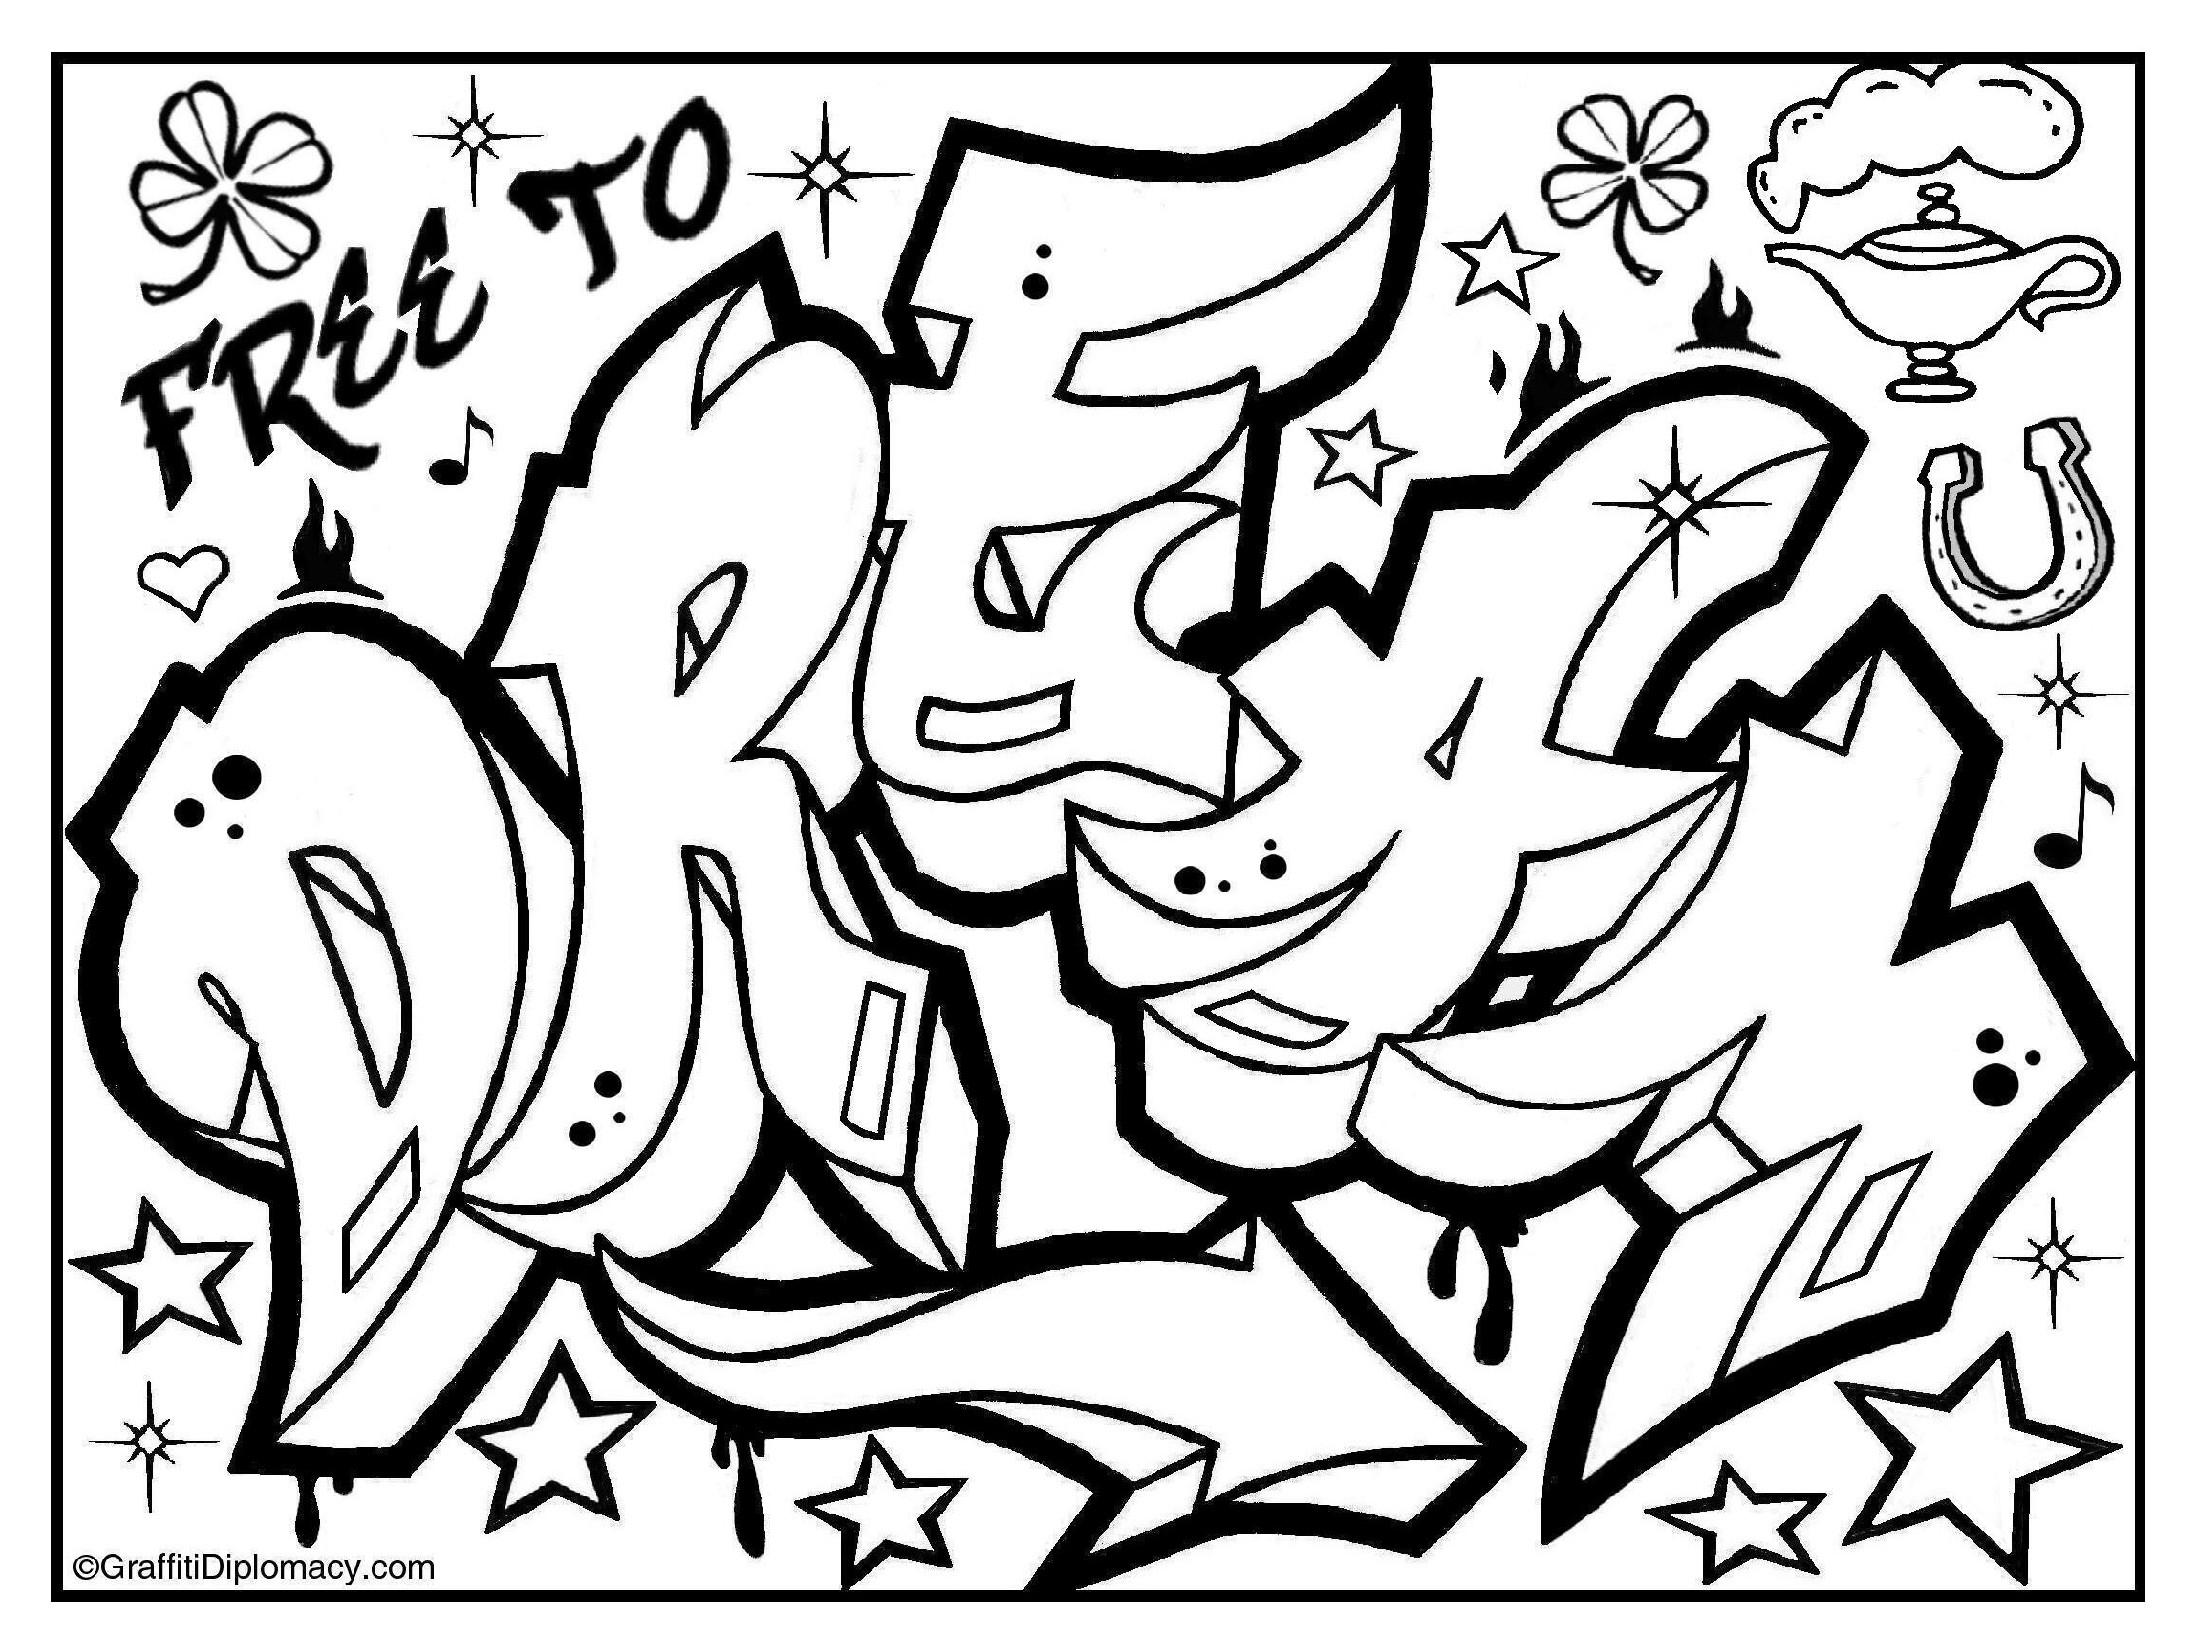 Swag Graffiti Coloring Pages At Getdrawings